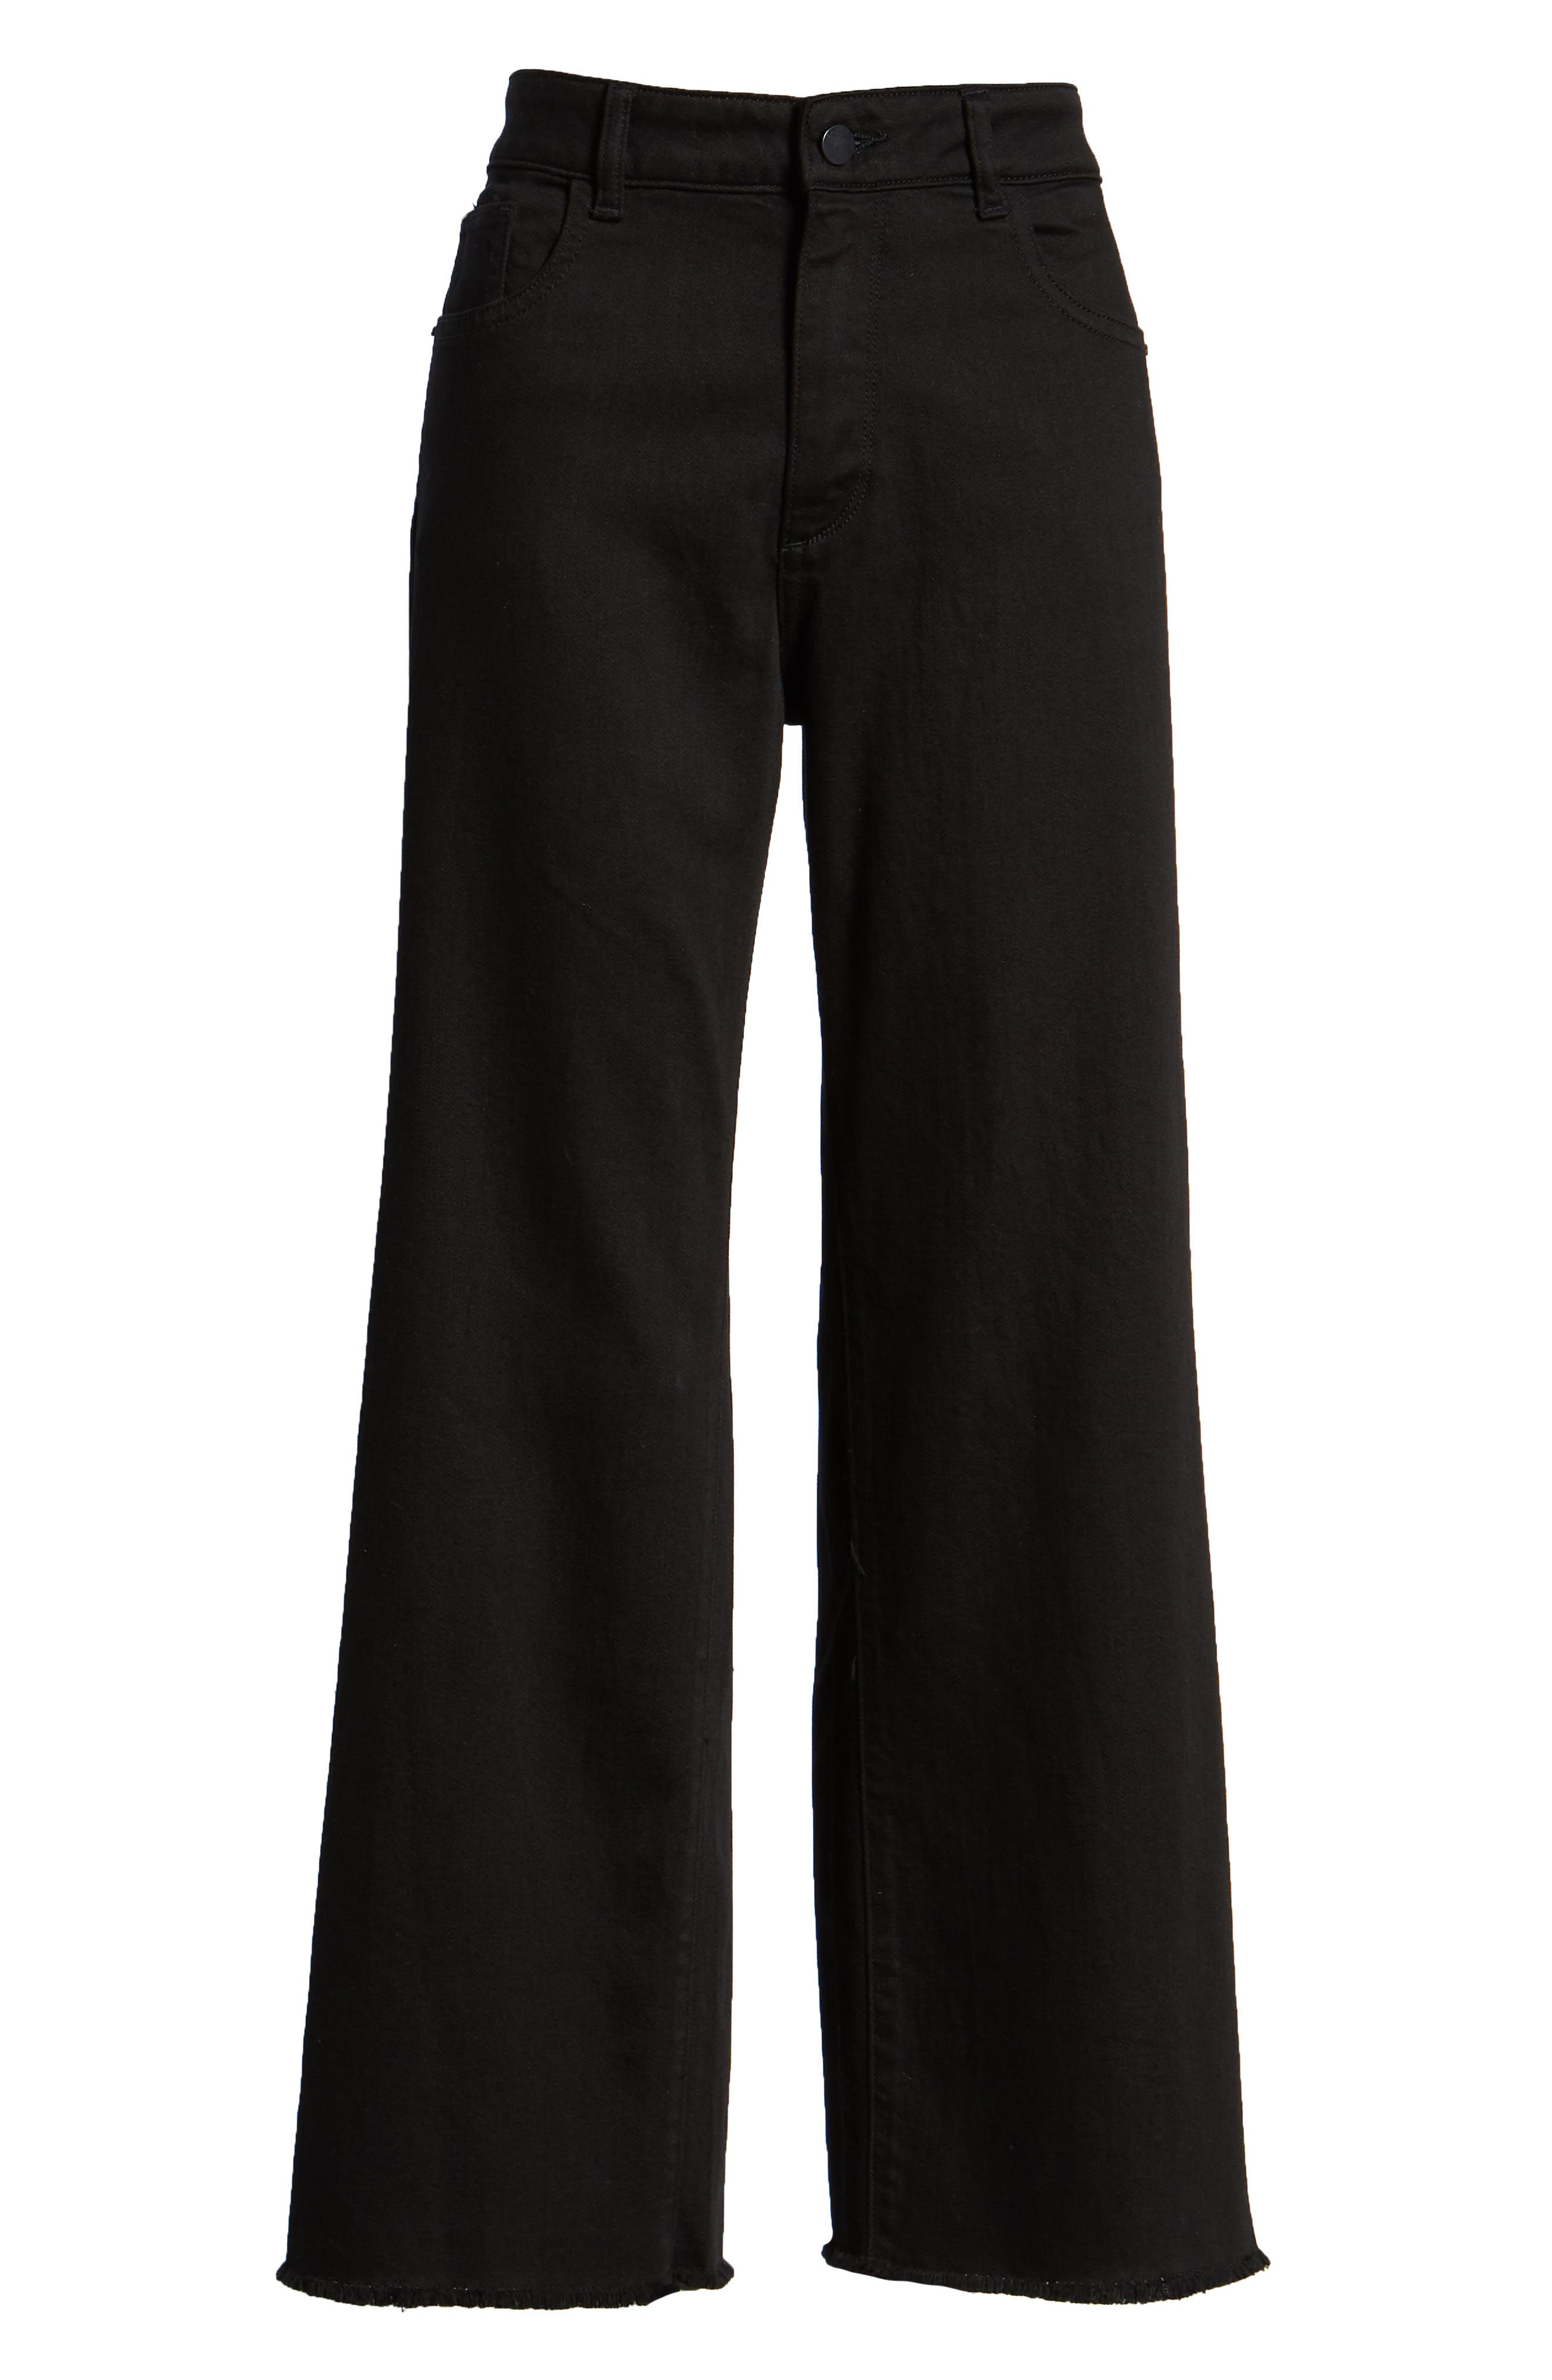 Hepburn High Waist Raw Hem Wide Leg Jeans,                             Alternate thumbnail 7, color,                             001